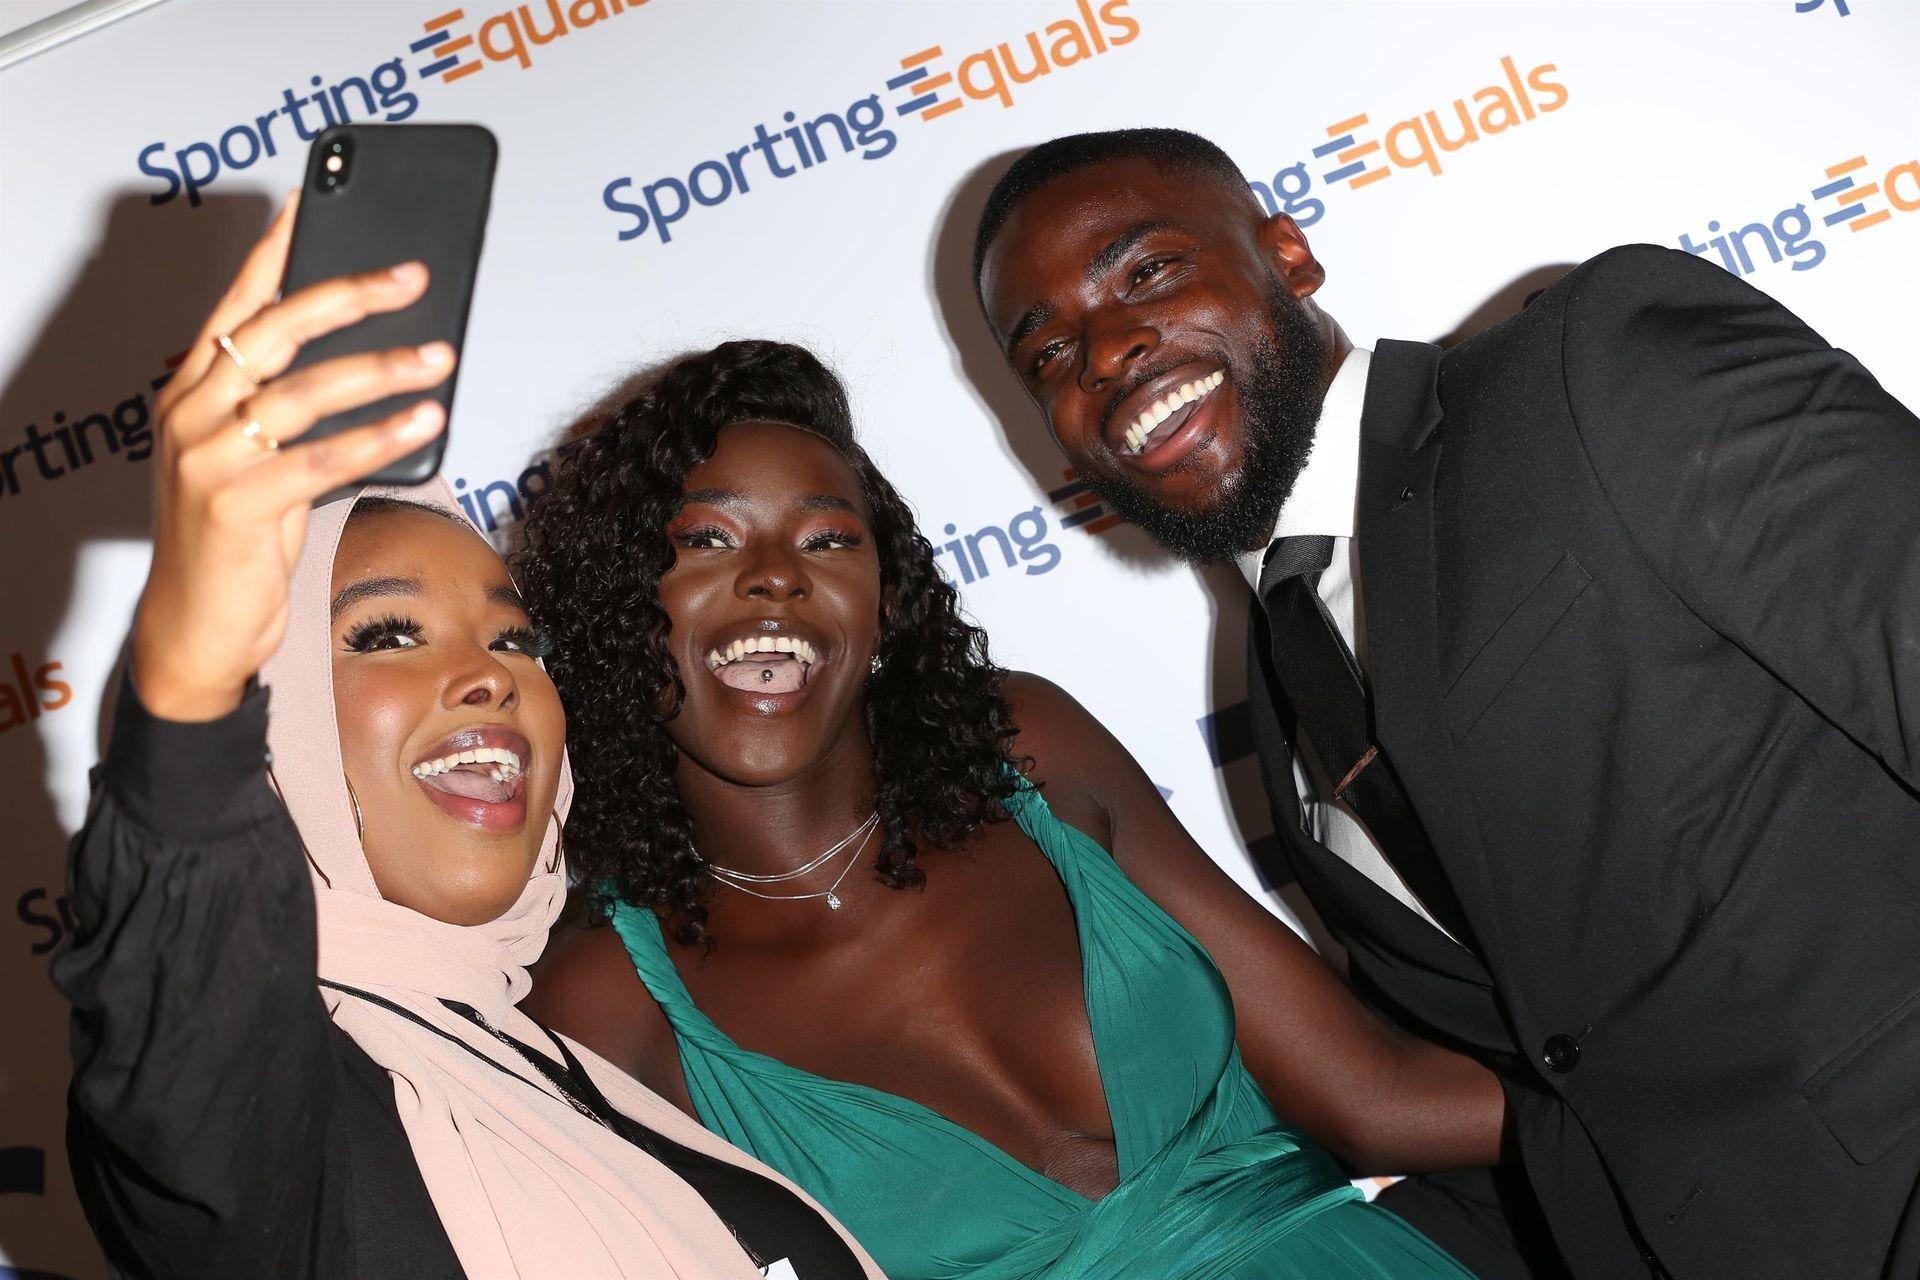 Mike Boateng & Priscilla Anyabu Are Seen At British Ethnic Diversity Sports Awards 0087